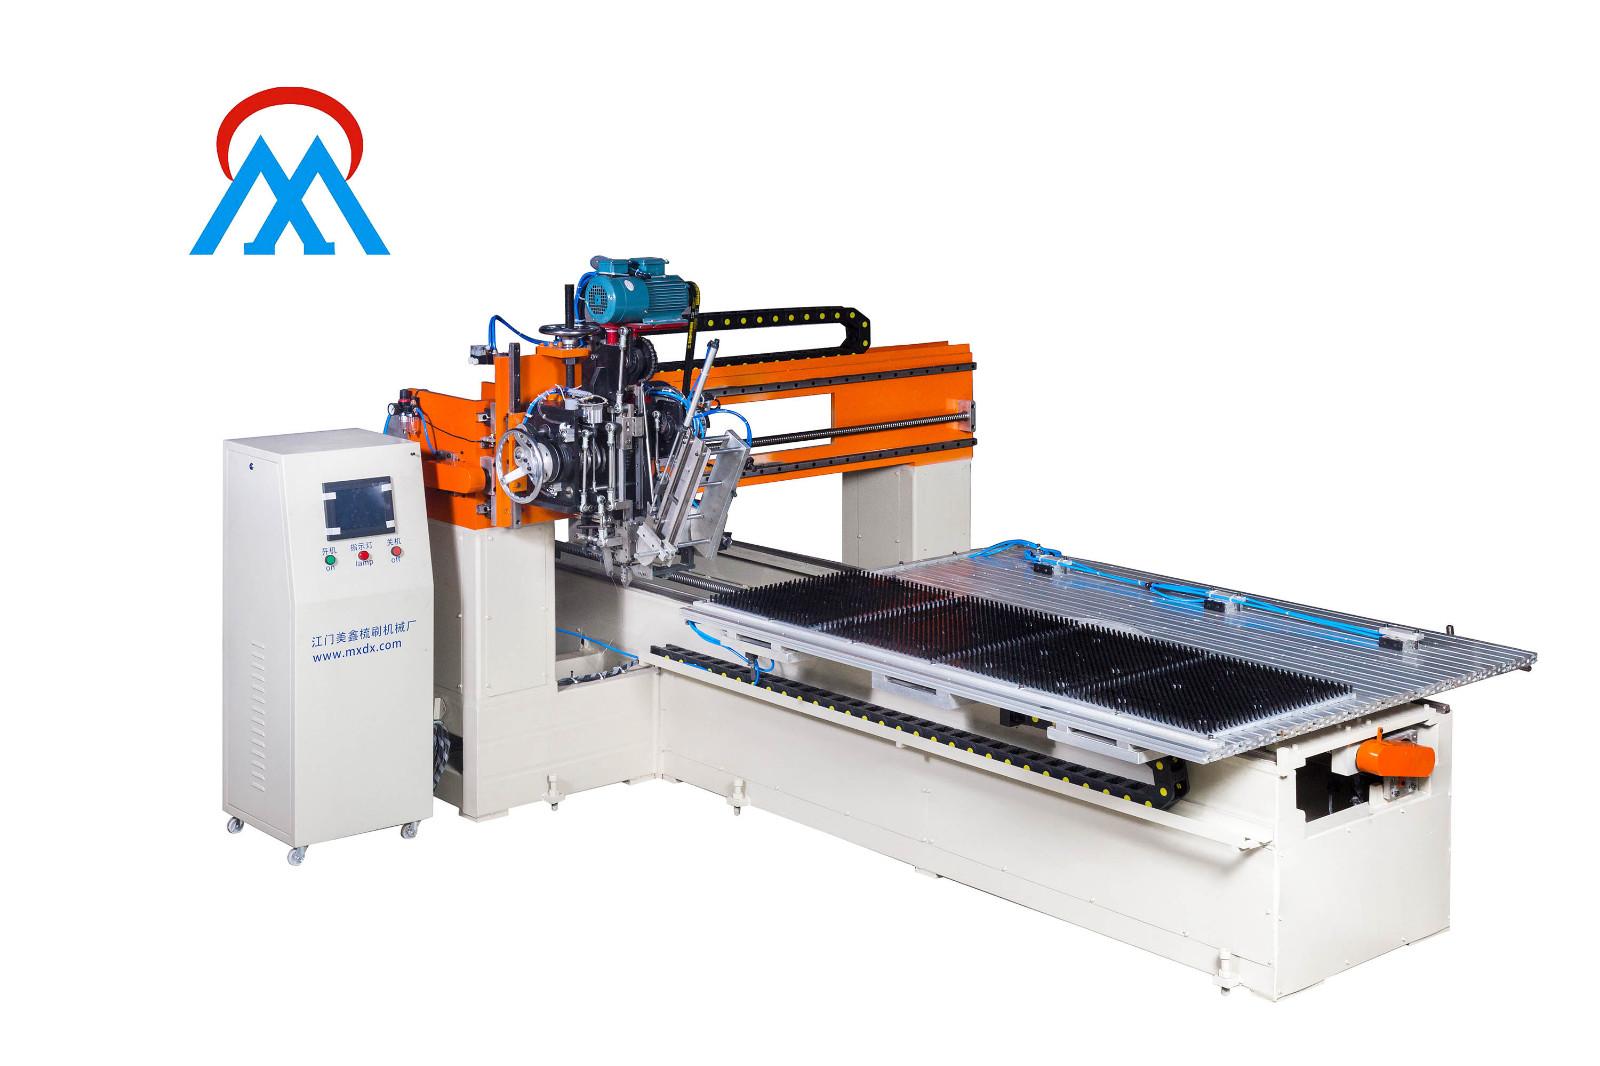 Meixin-One Roller Brush Machine Ship To Vietnam - Meixin Comb Brush-2